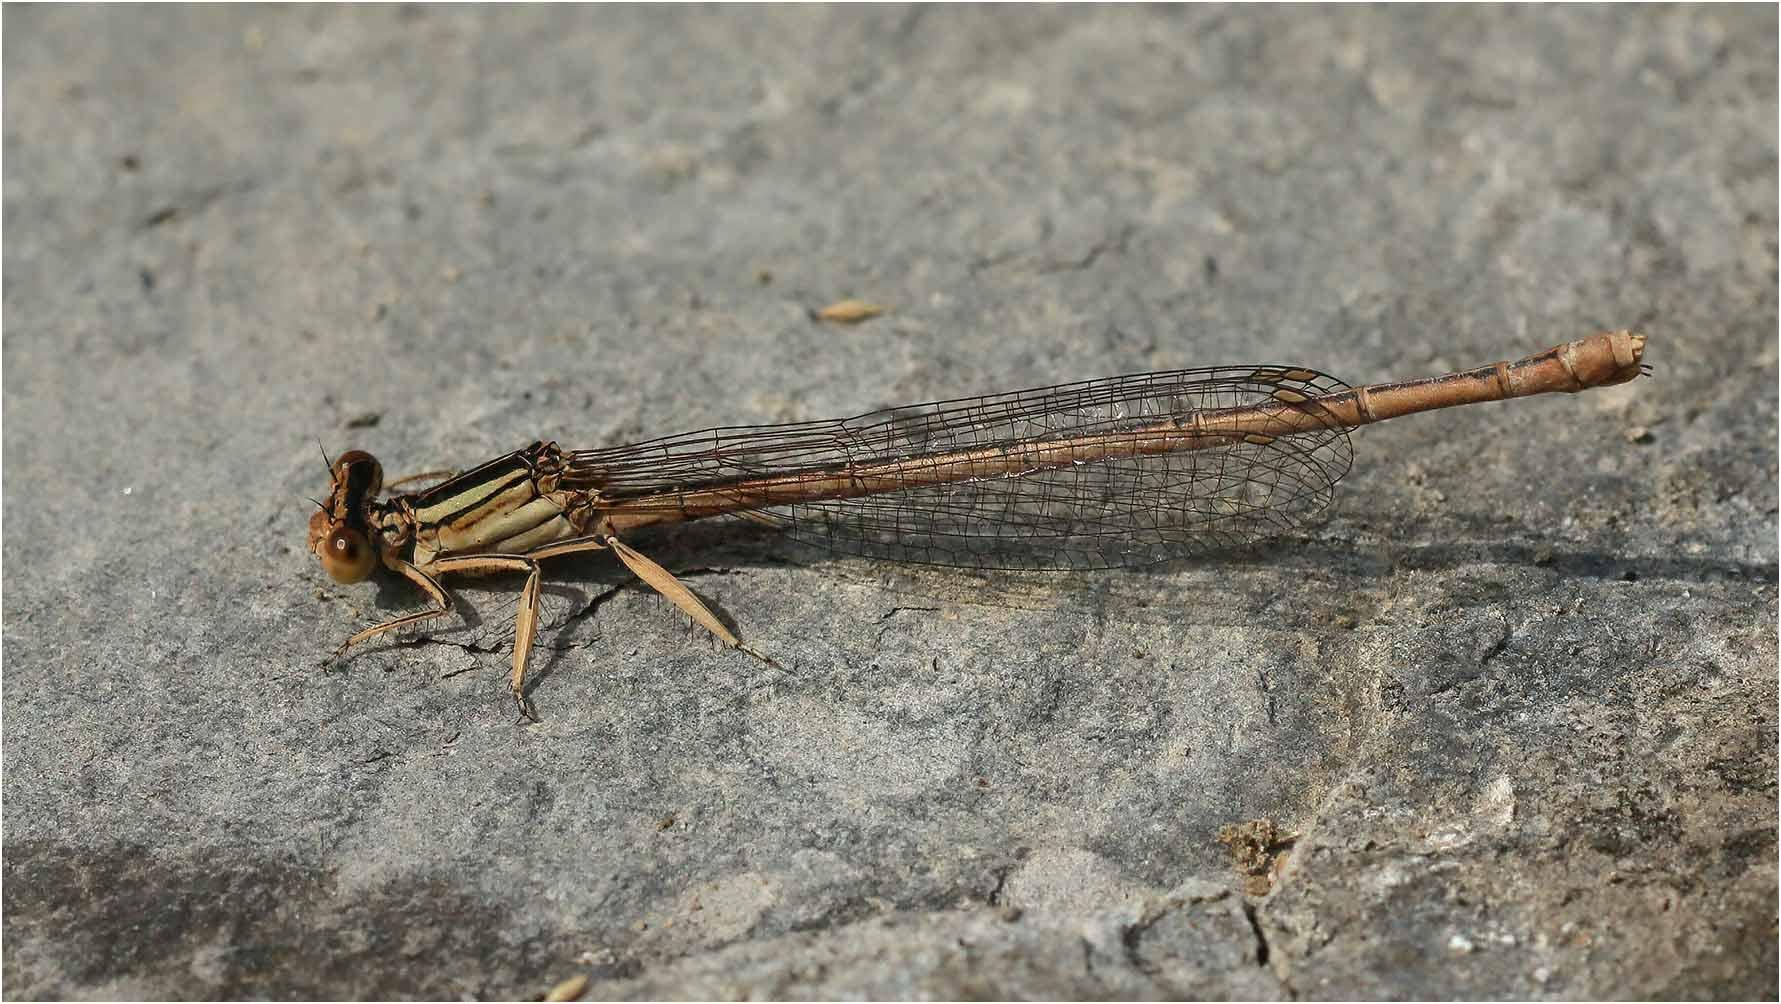 Platycnemis latipes femelle, Montreal (France-07), 14/07/2020